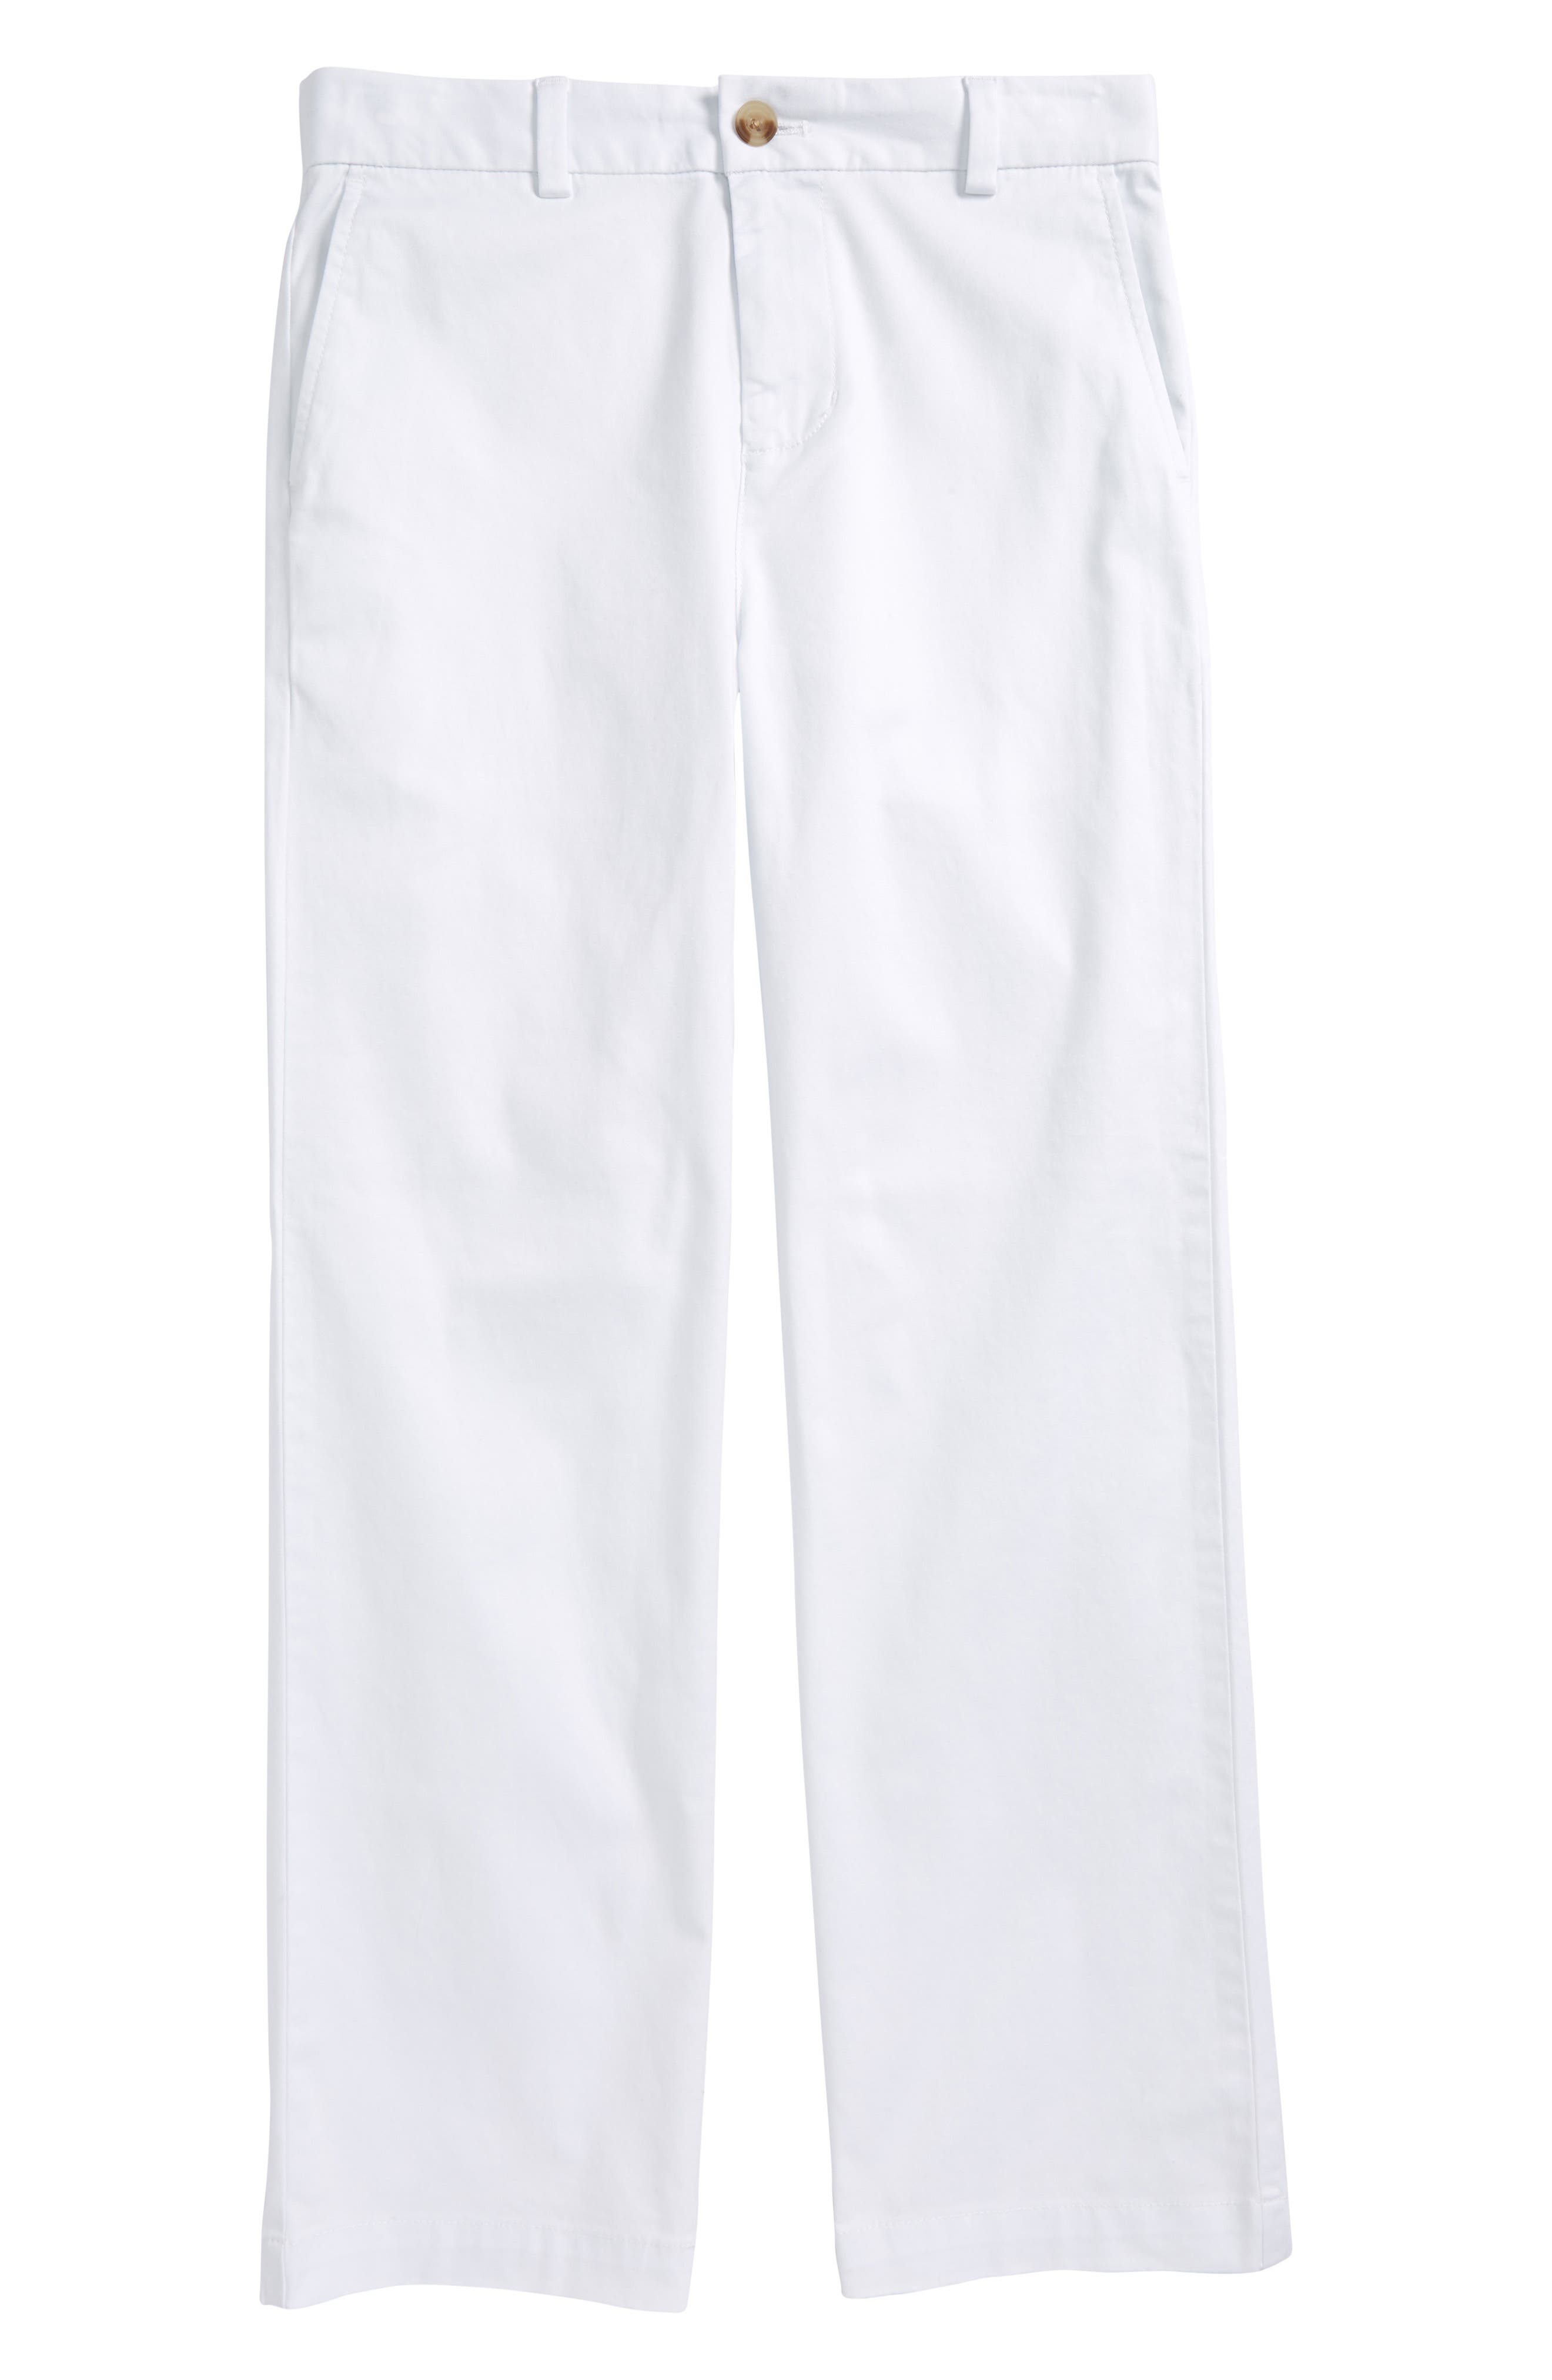 Stretch Breaker Pants,                         Main,                         color, White Cap